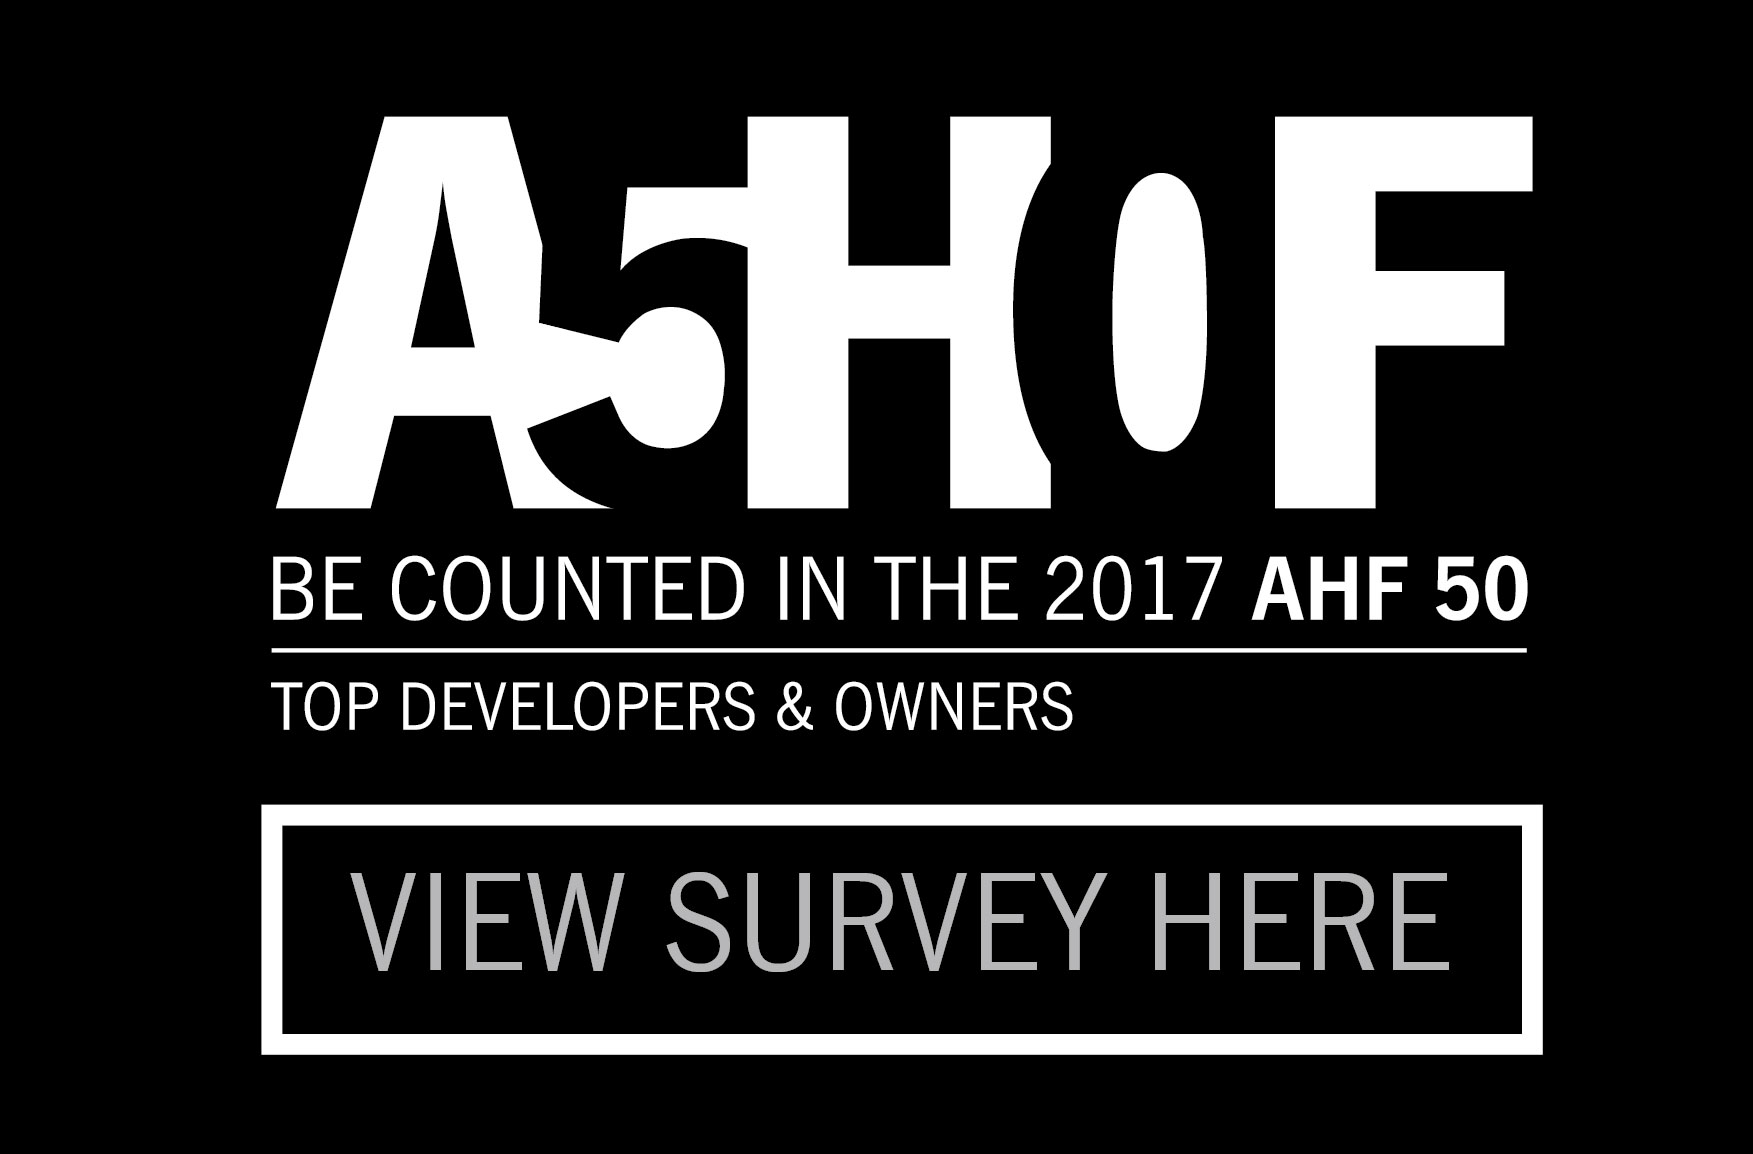 AHF50 Survey